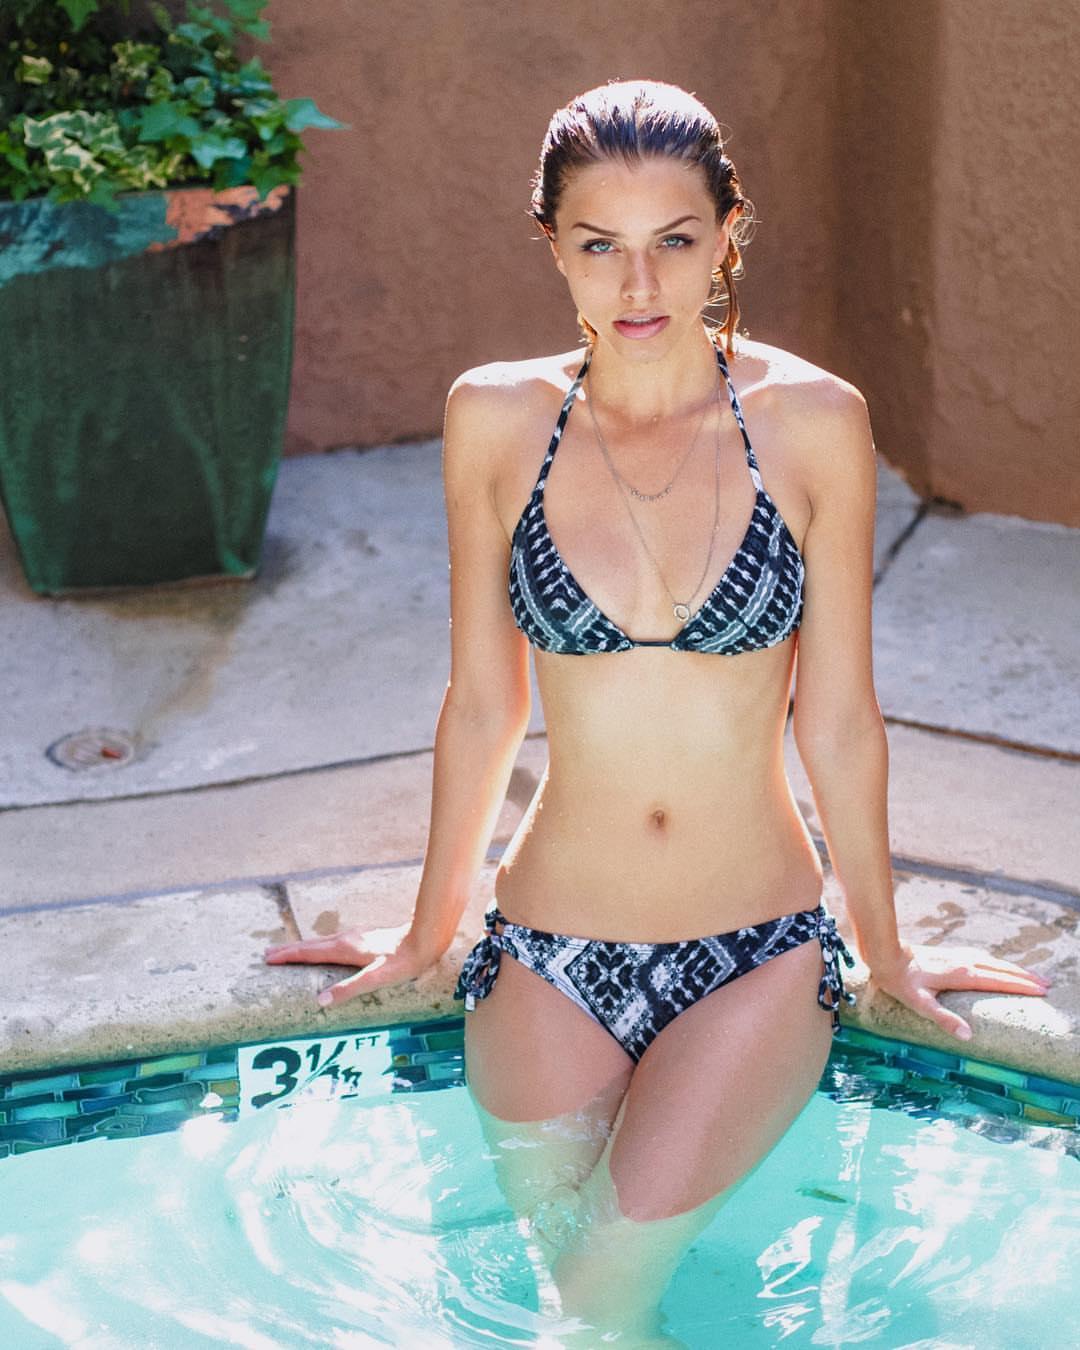 Marina Laswick: Hot, Active, And Nostalgic